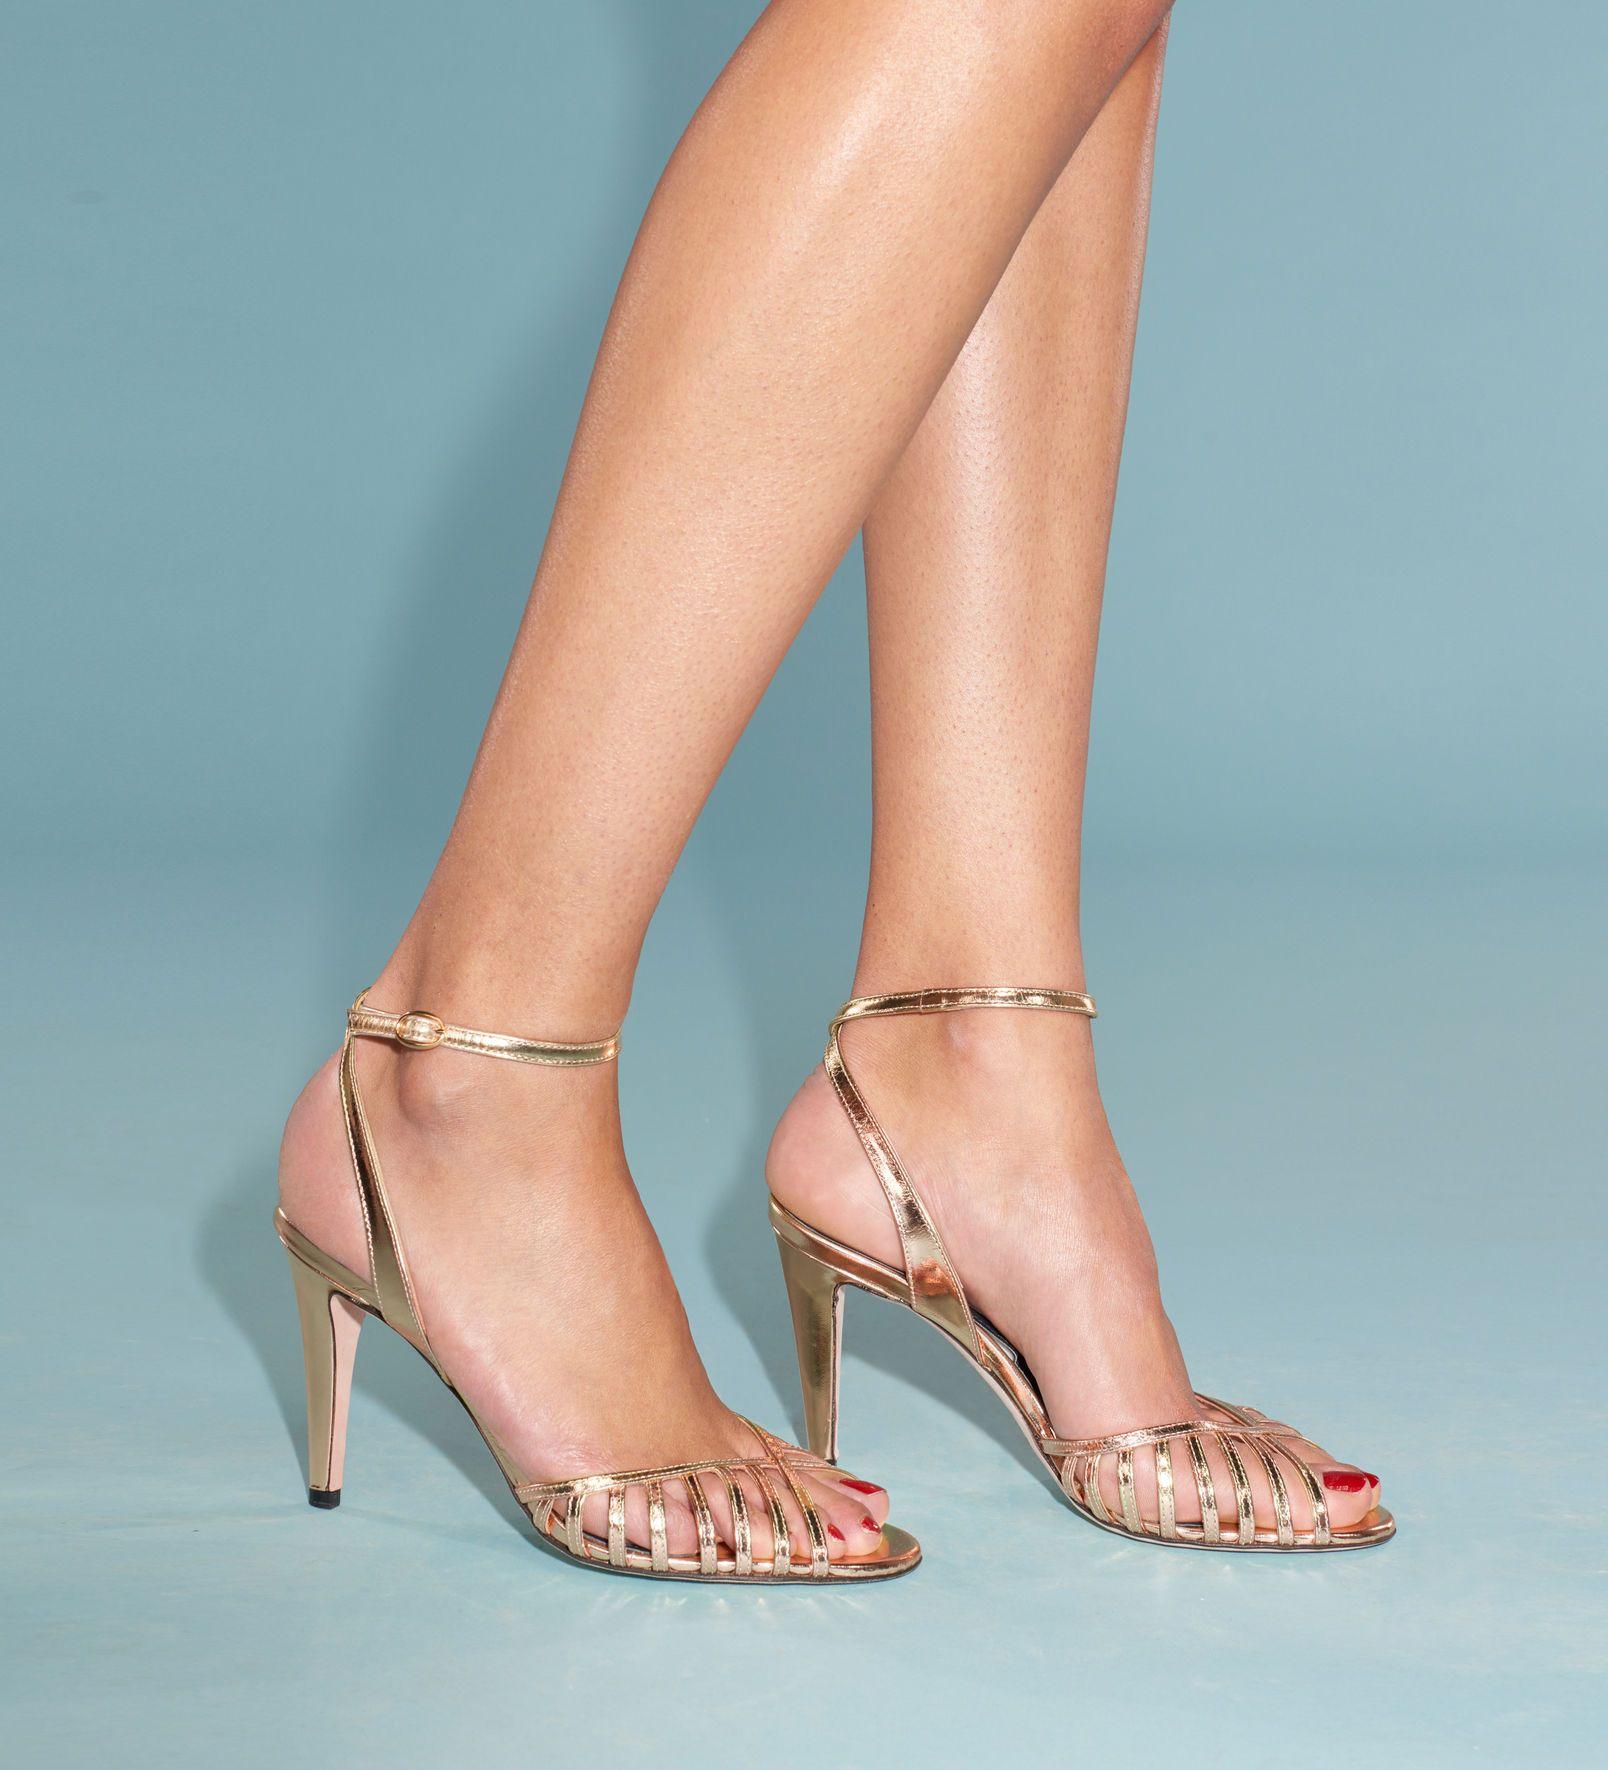 1797da10f9cd4 Vanessa Seward Gold Sandals